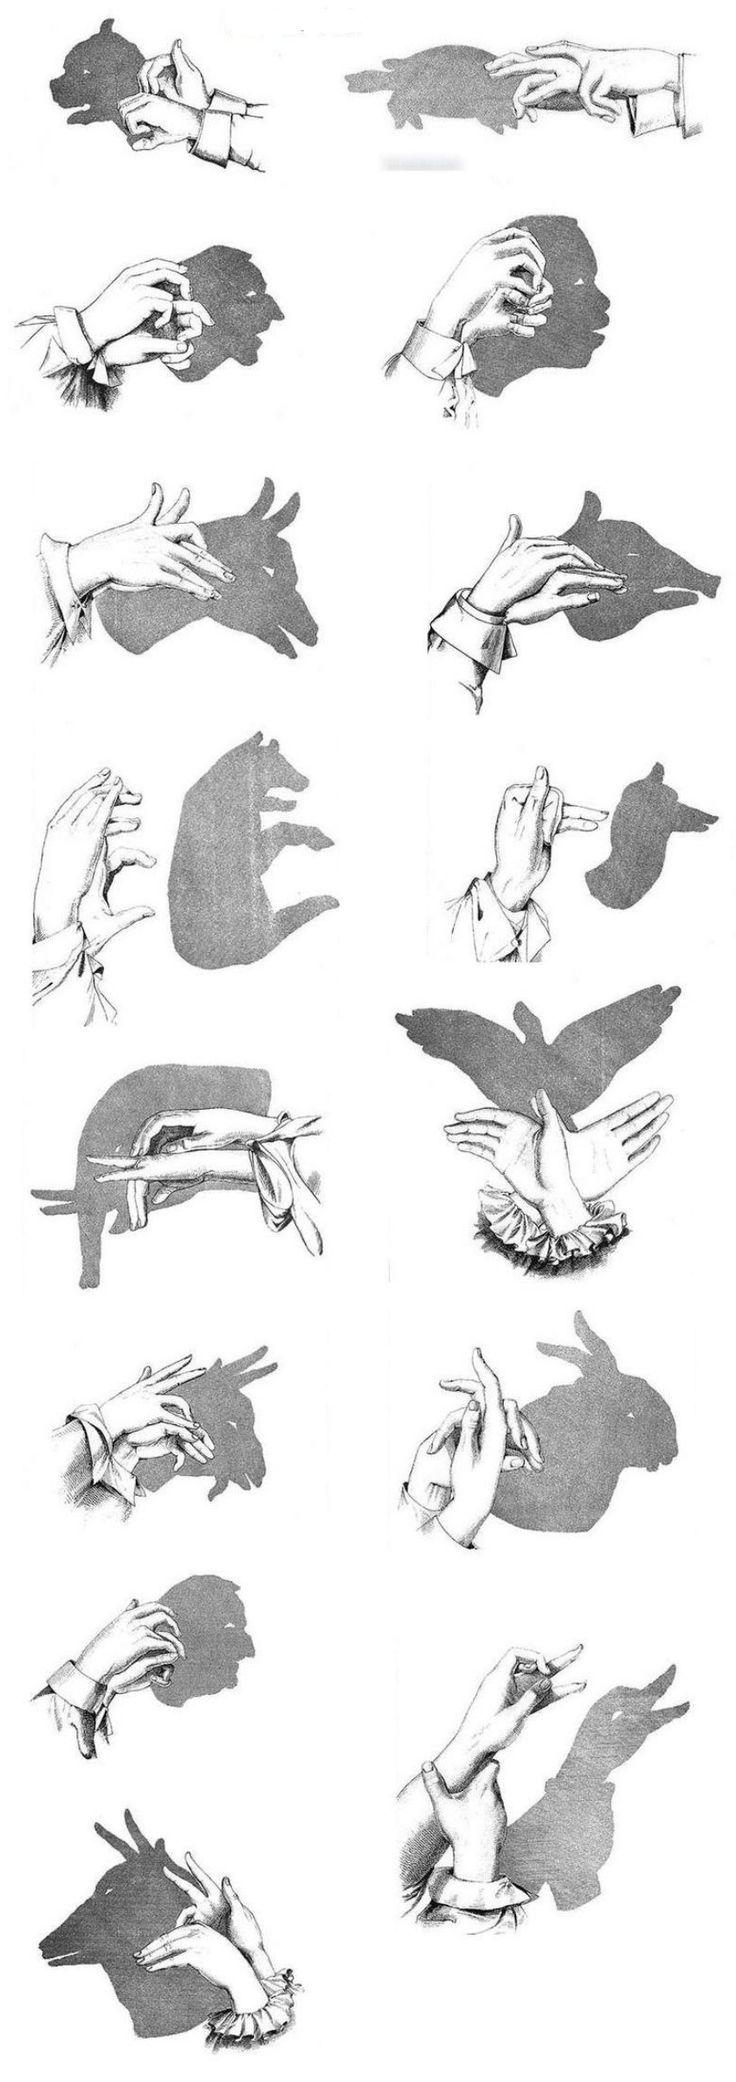 Drawn rat shadow Tree The puppets tattoos 25+